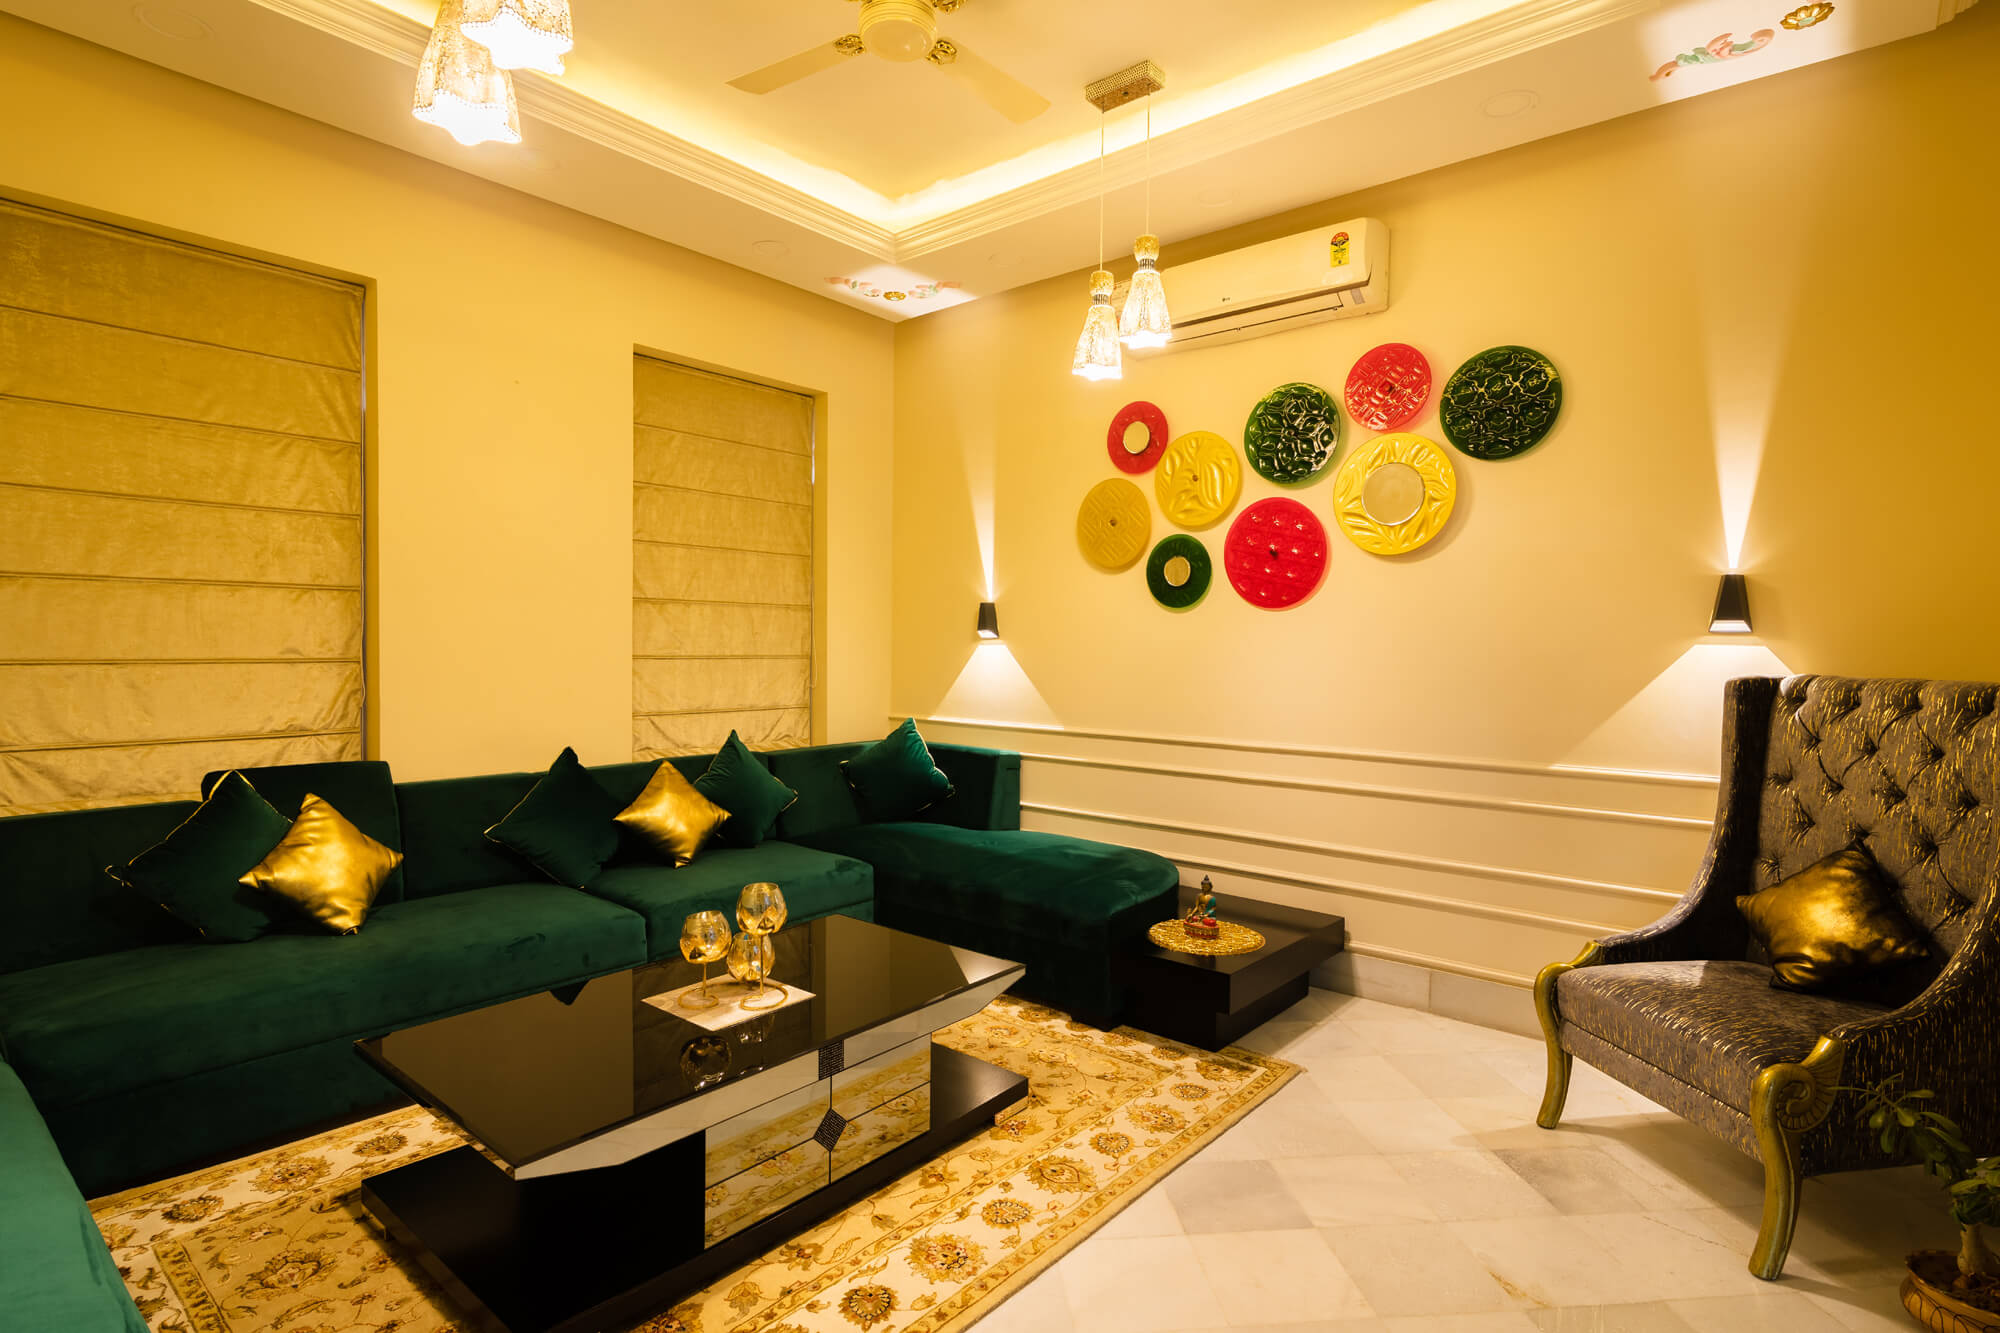 77 Contours - Sahiba Design Studio Projects - Best Architect Designing in Mumbai Jaipur